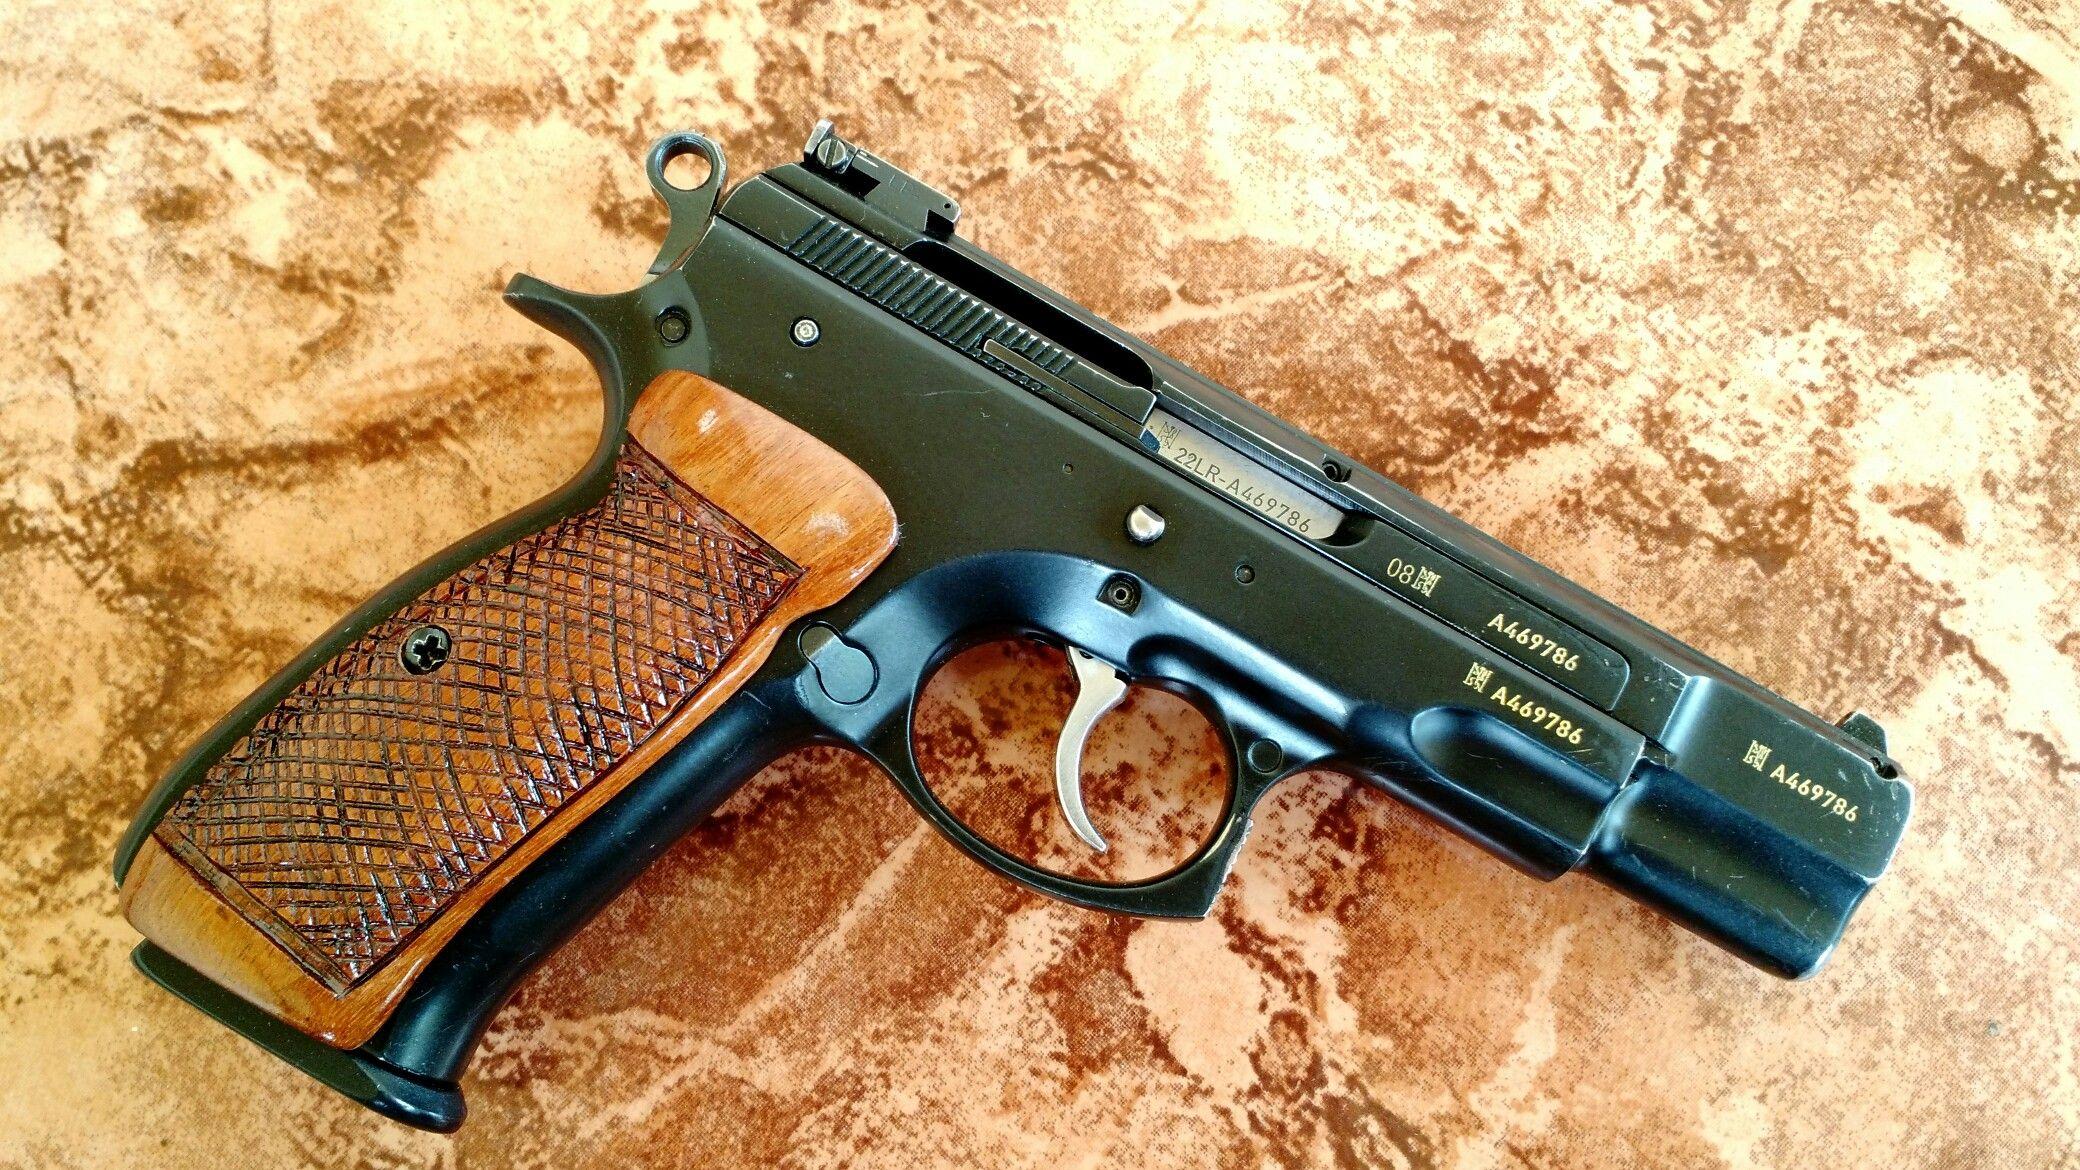 CZ 75 Kadet 22LR + Homemade wood grips   Products I Love   Hand guns